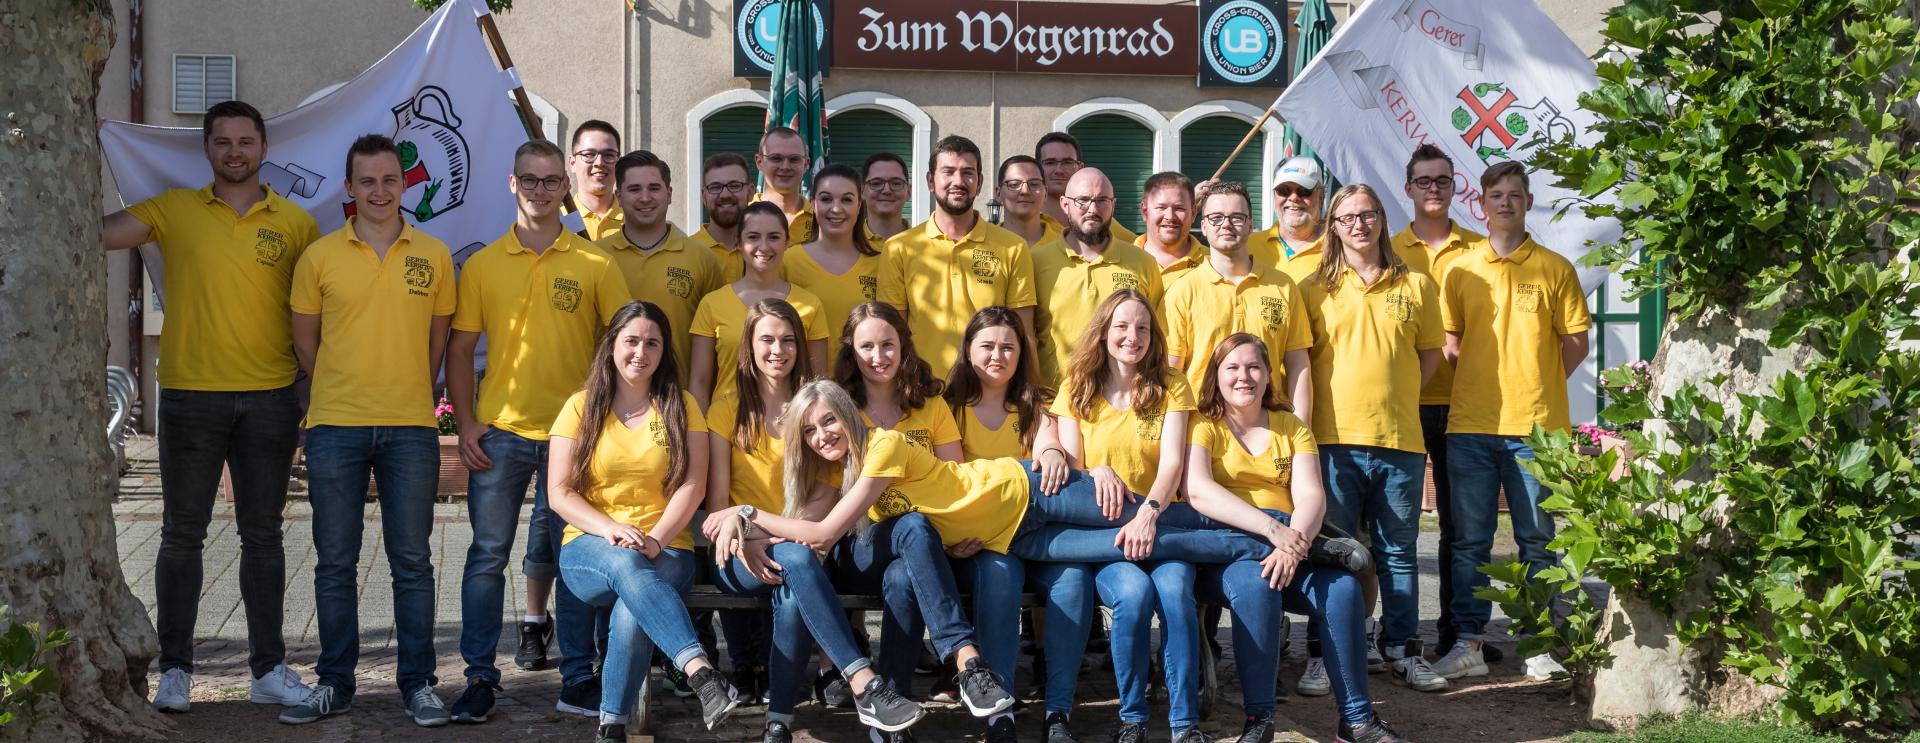 2019-Kerb-GG-jochenmelchior-40_Slider